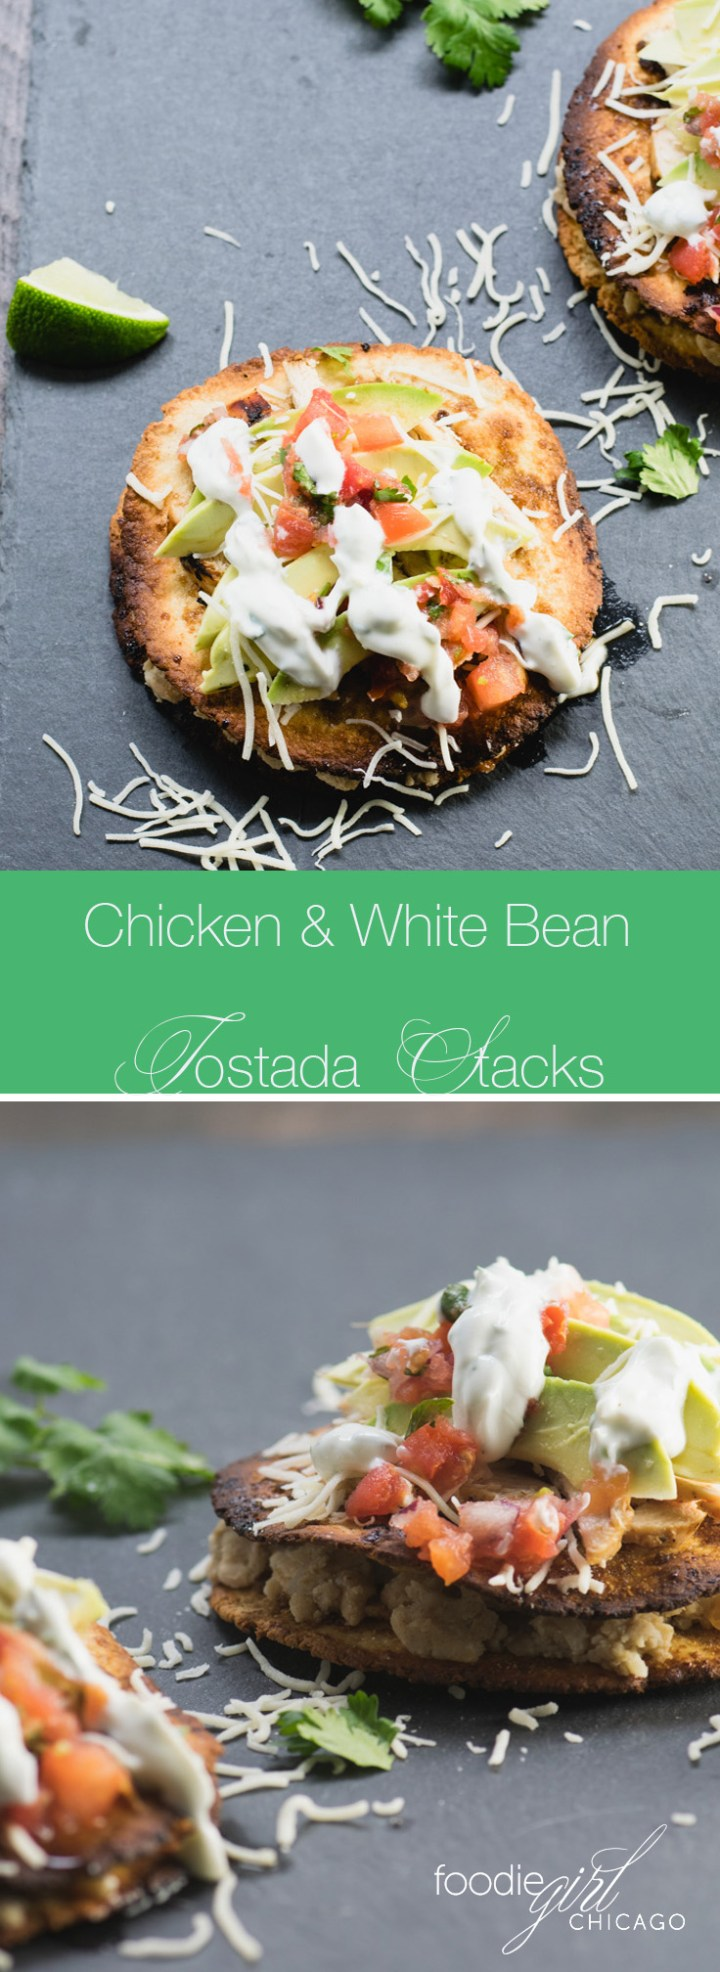 Chicken & White Bean Tostada Stacks